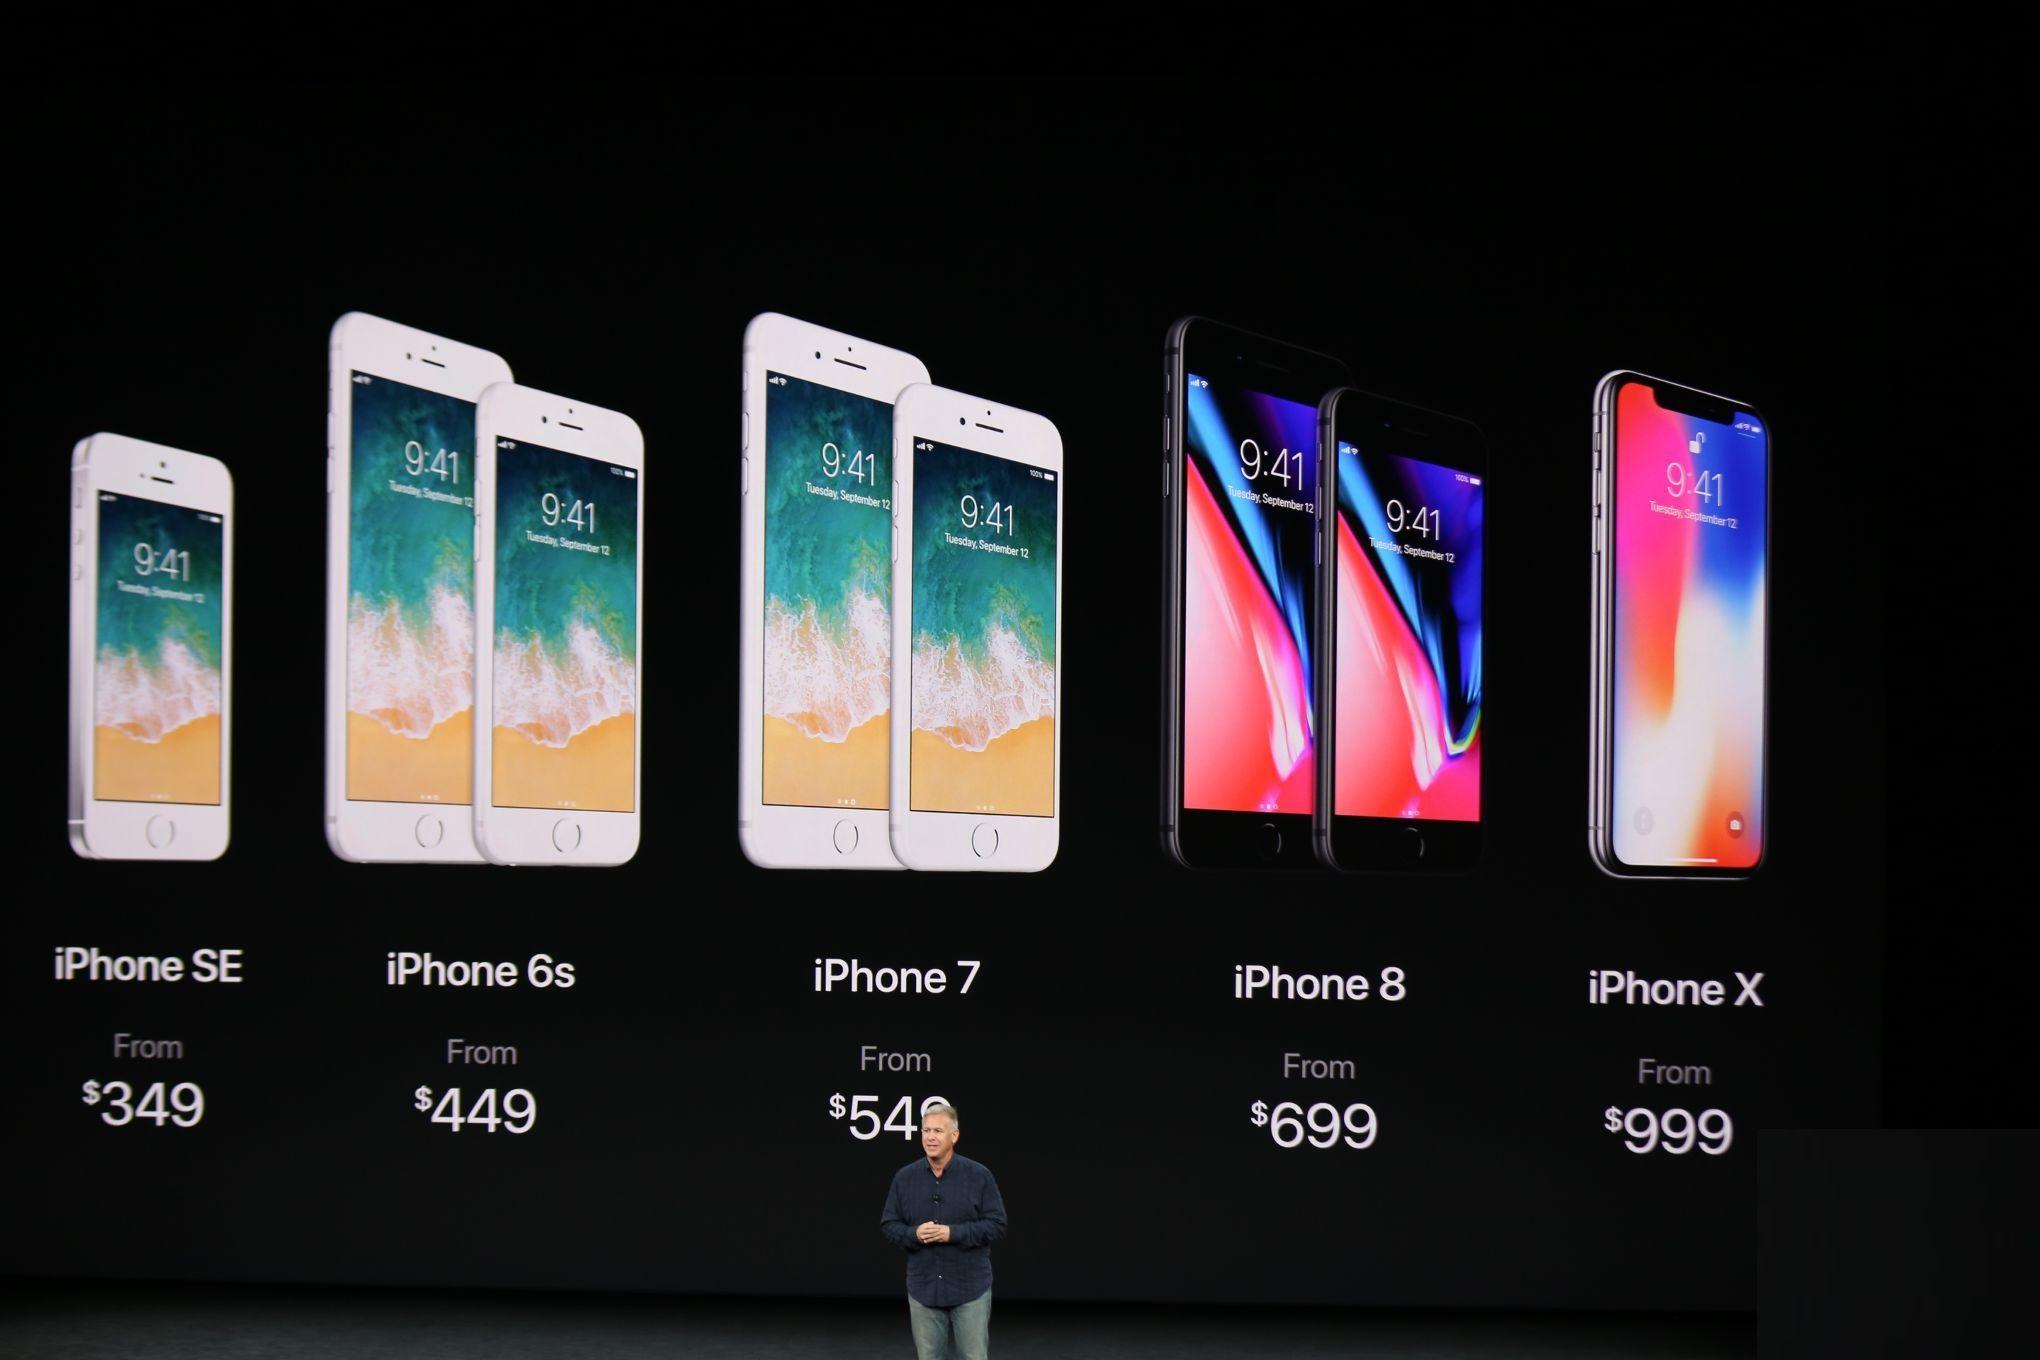 apple-iphone-2017-20170912-12127